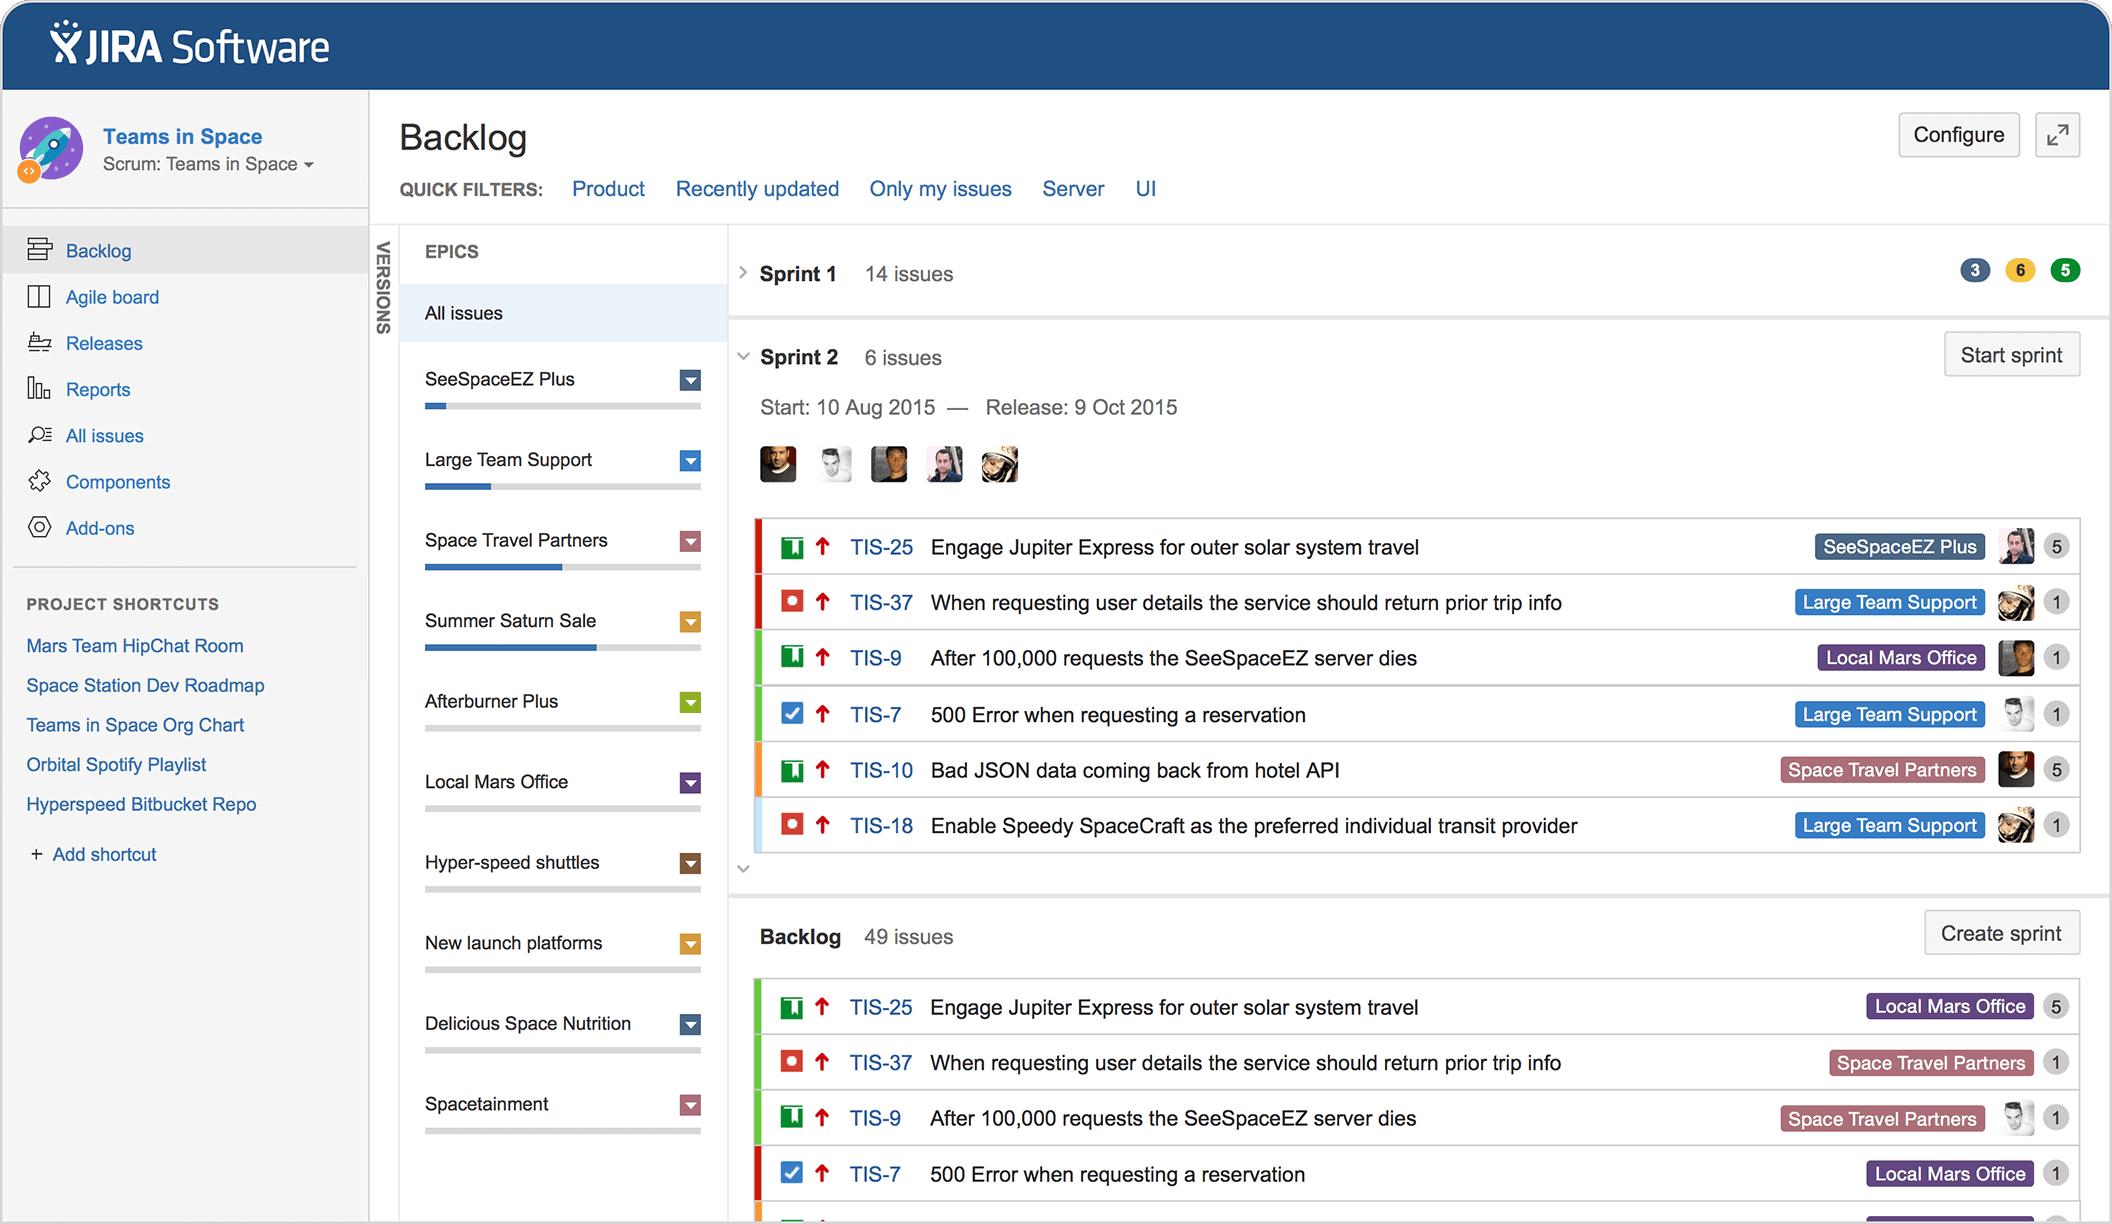 Jira Software Issue Project Tracking For Software Teams Atlassian Projet De Developpement Logiciel Methode Agile